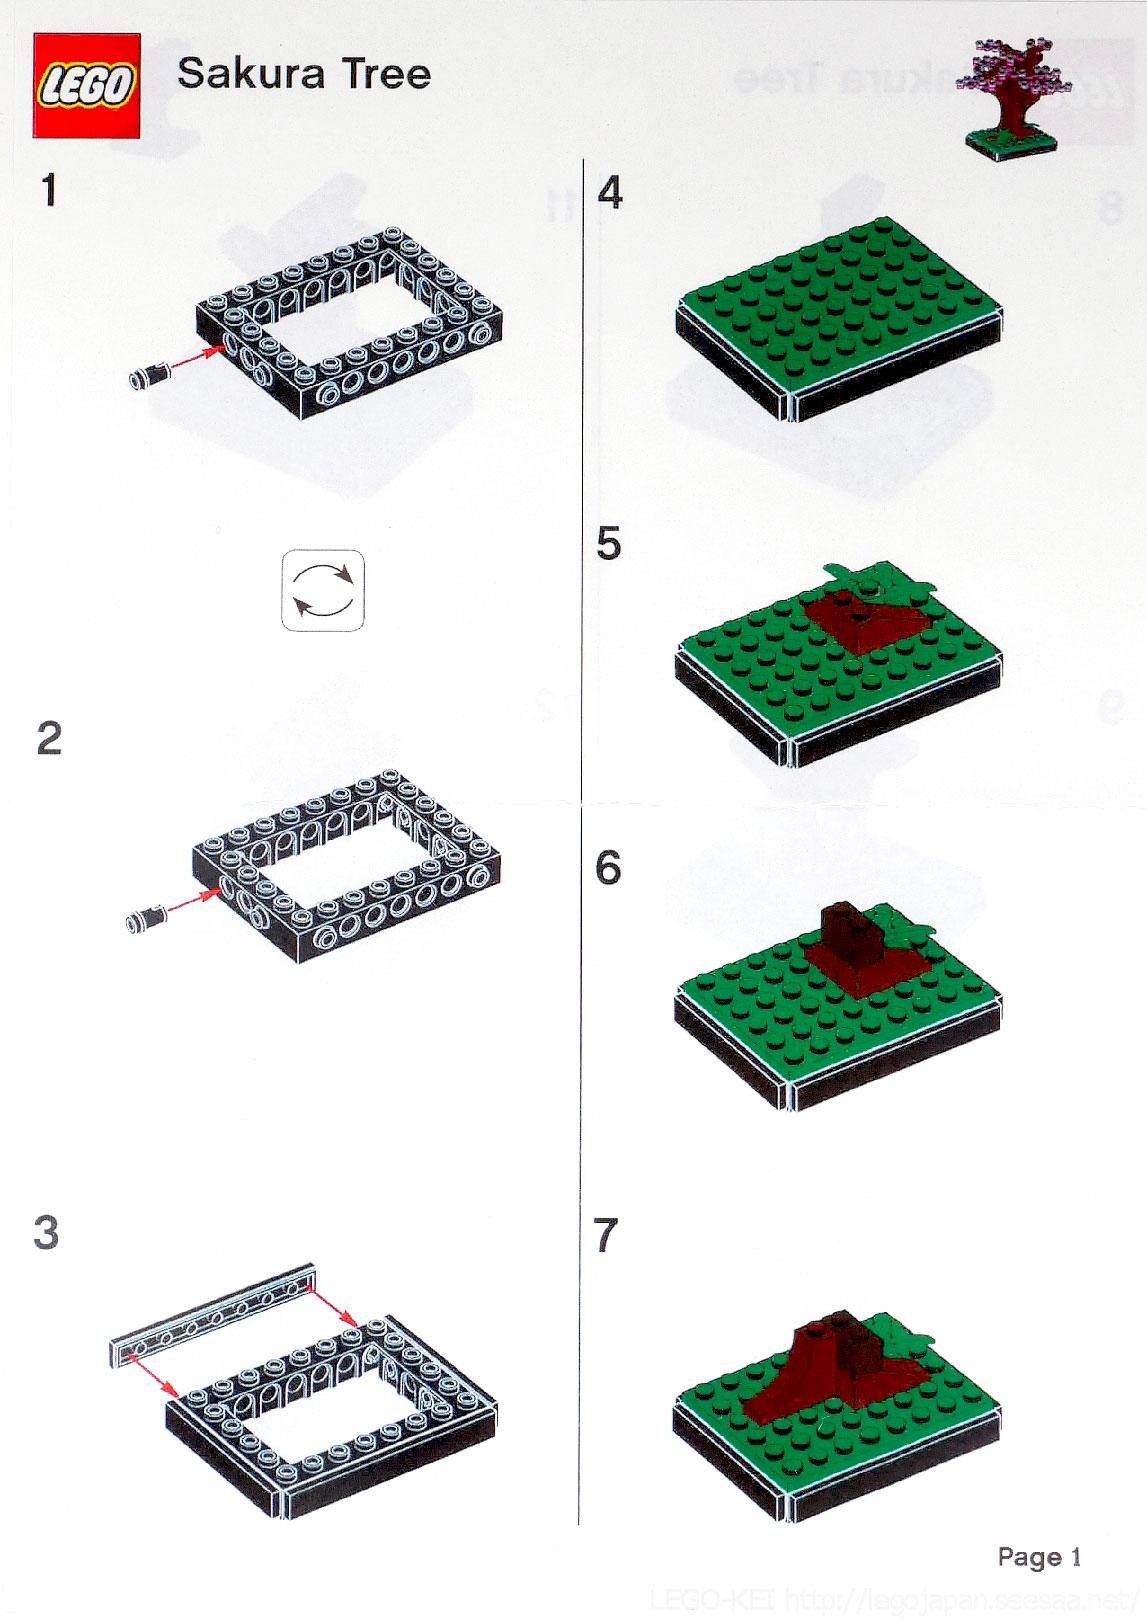 LEGO_Sakura_inst01_1619